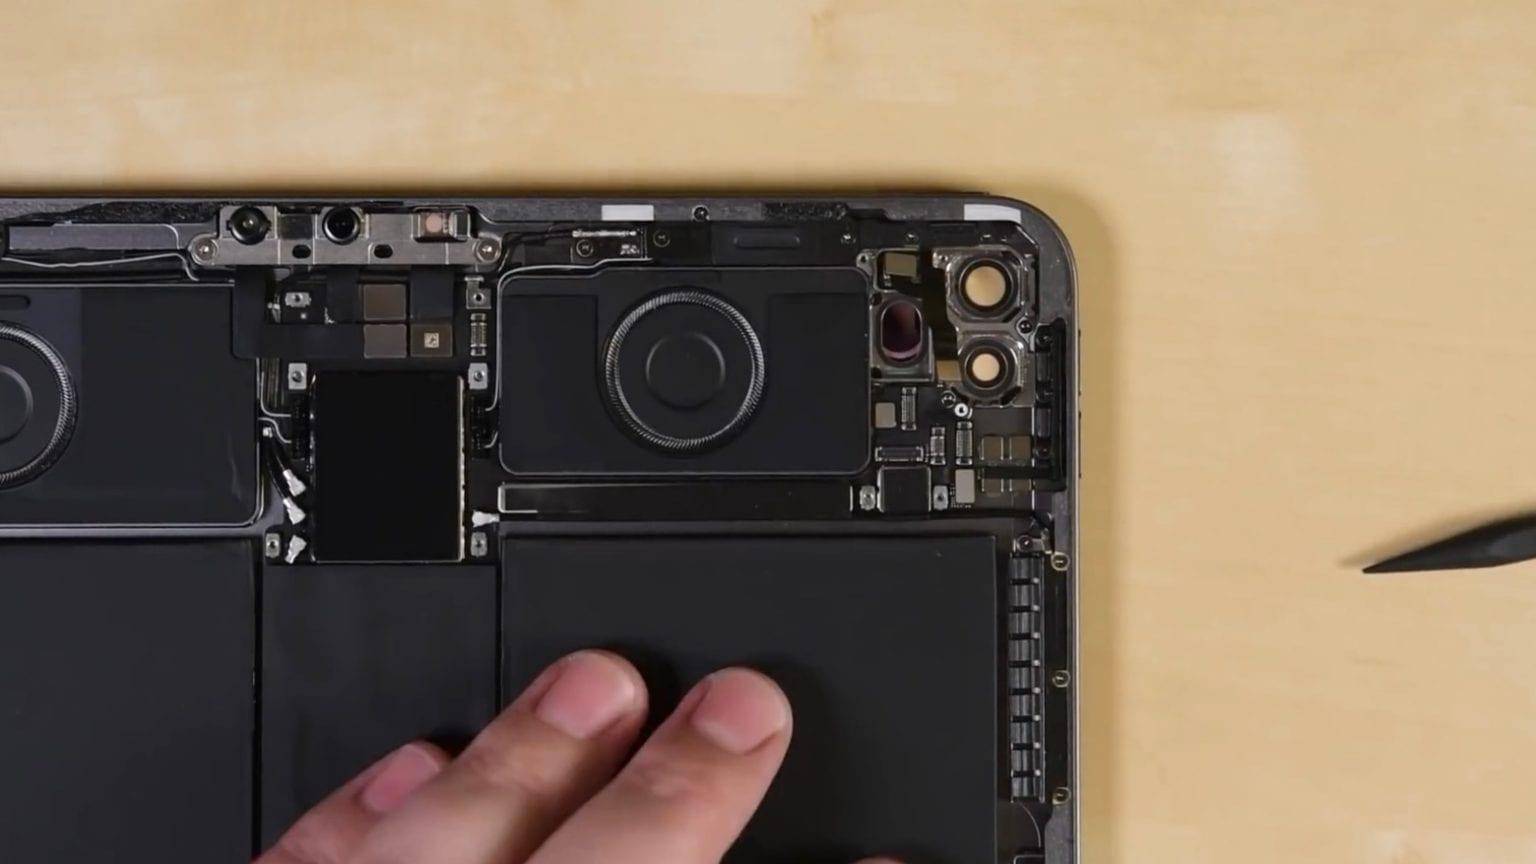 2020 iPad Pro has dual cameras and a LiDAR scanner.